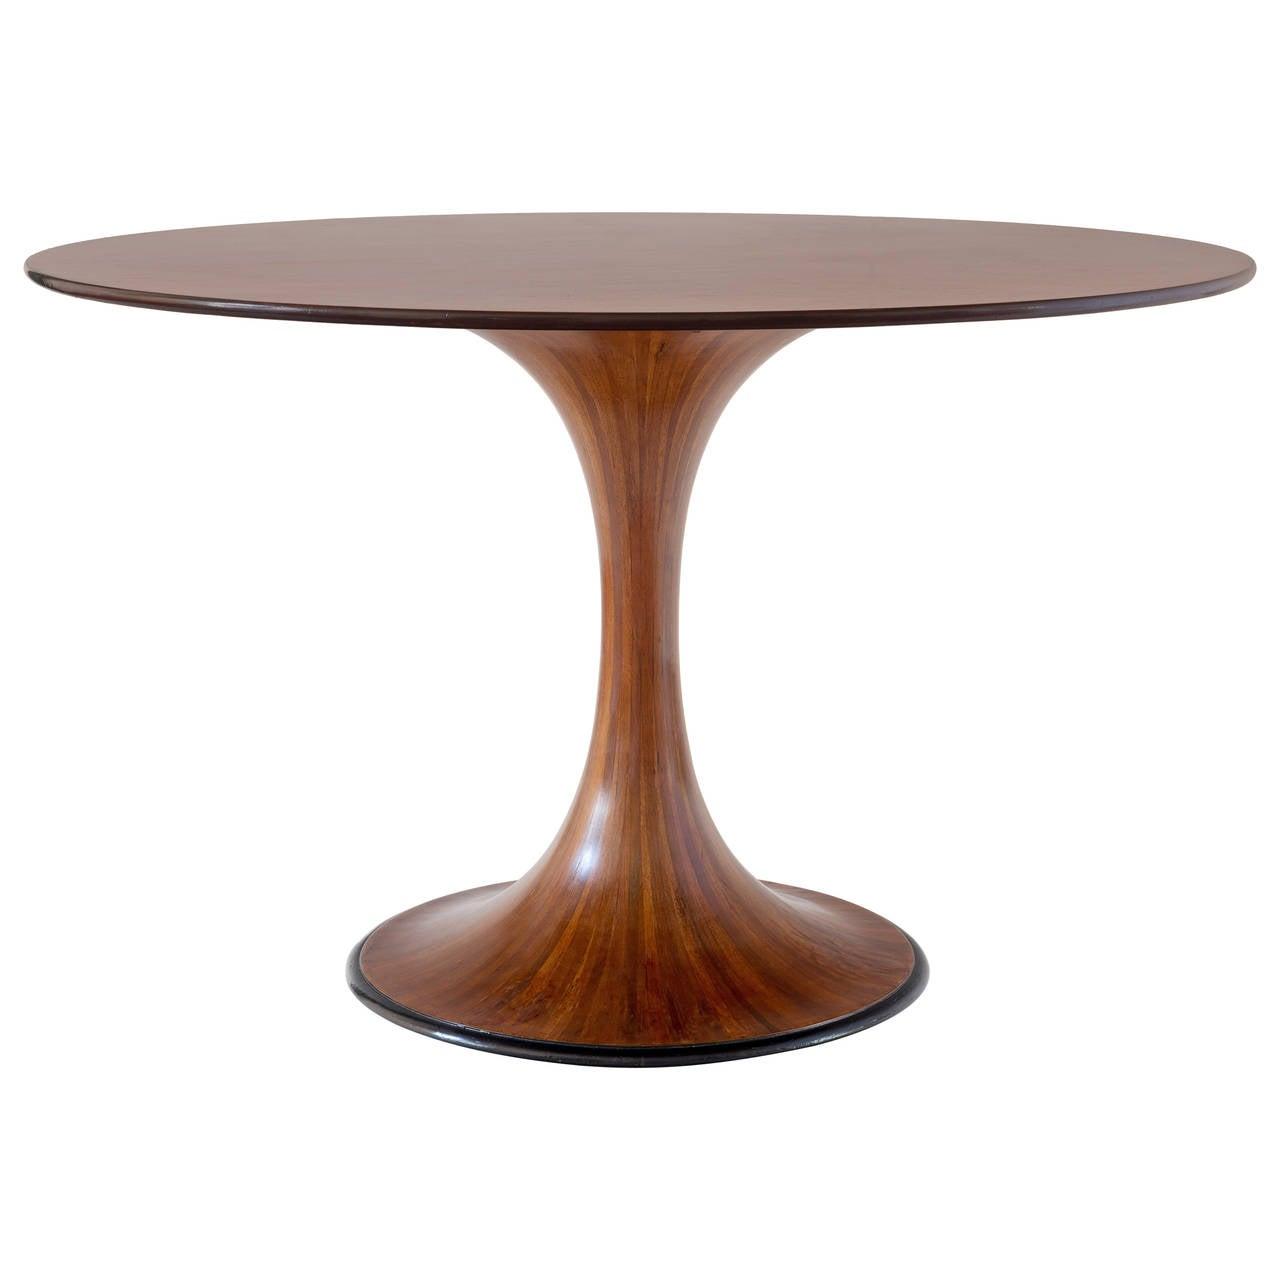 This Luigi Massoni Clessidra Pedestal Dining Table1959 Is No Longer